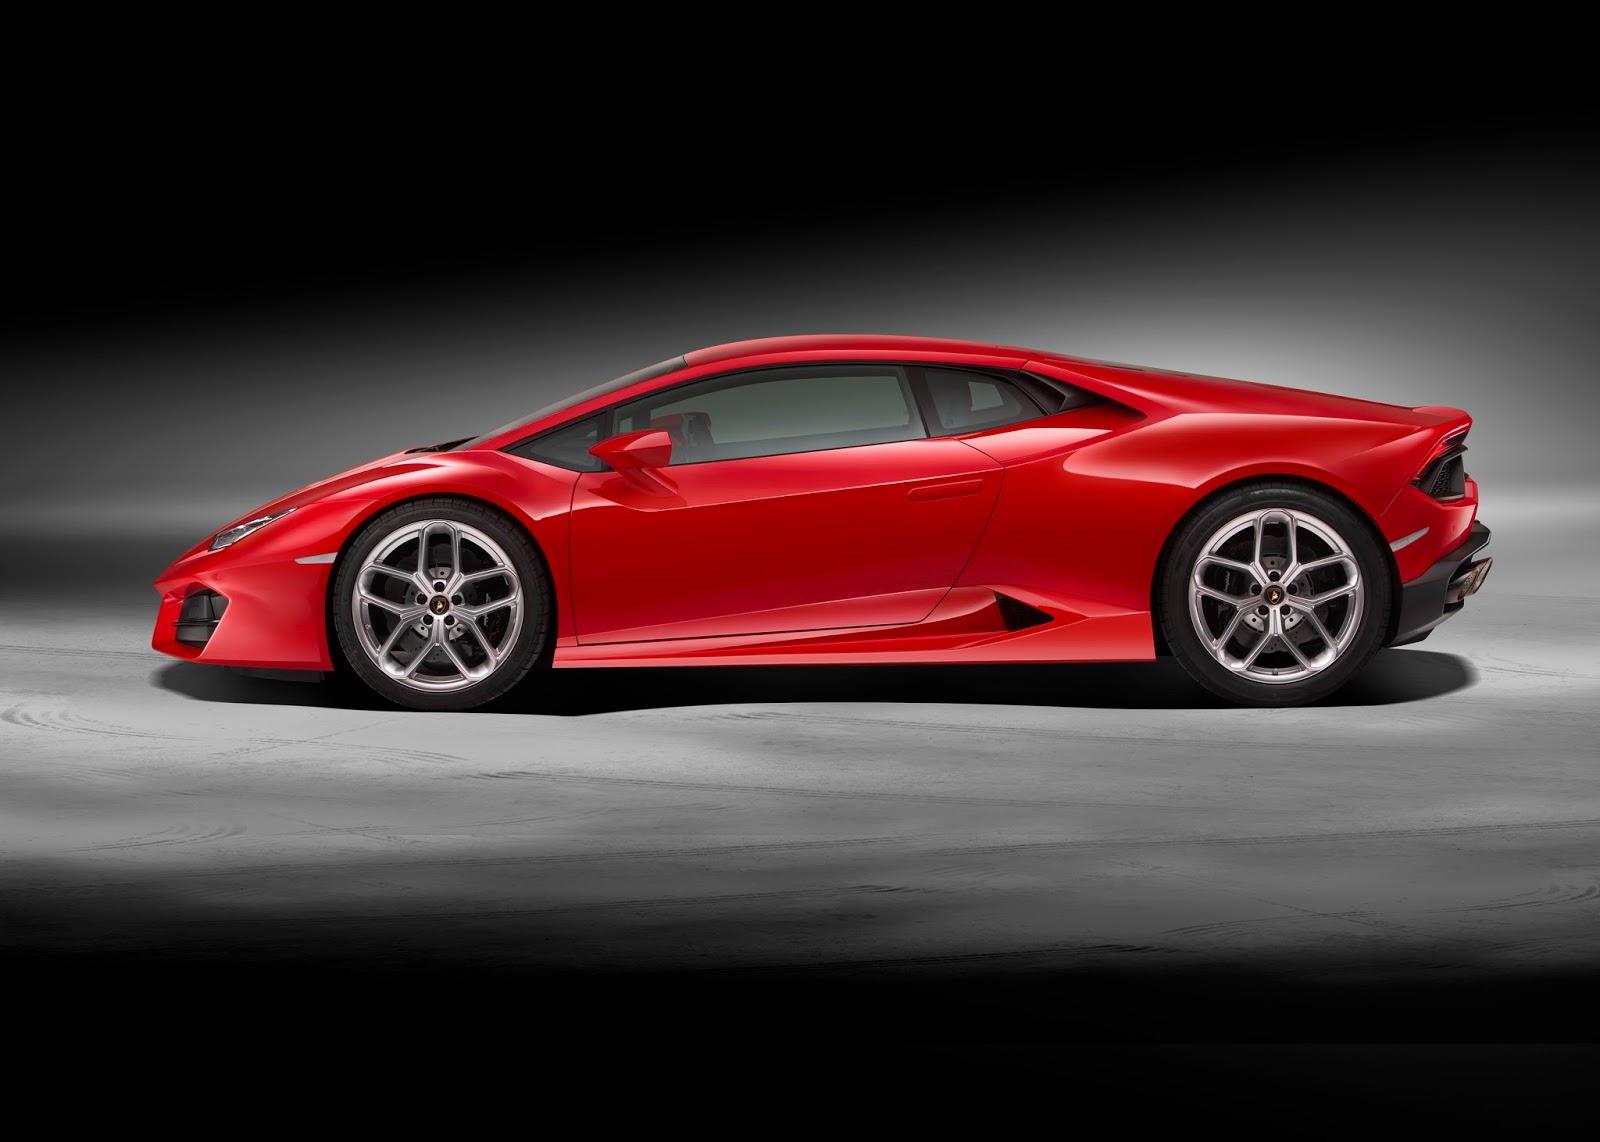 409537 Lamborghini Huracan LP580-2 : Η πιο fun to drive Lamborghini είναι πισωκίνητη και η φθηνότερη Lamborghini, Lamborghini Huracan, Lamborghini Huracan LP580-2, supercars, videos